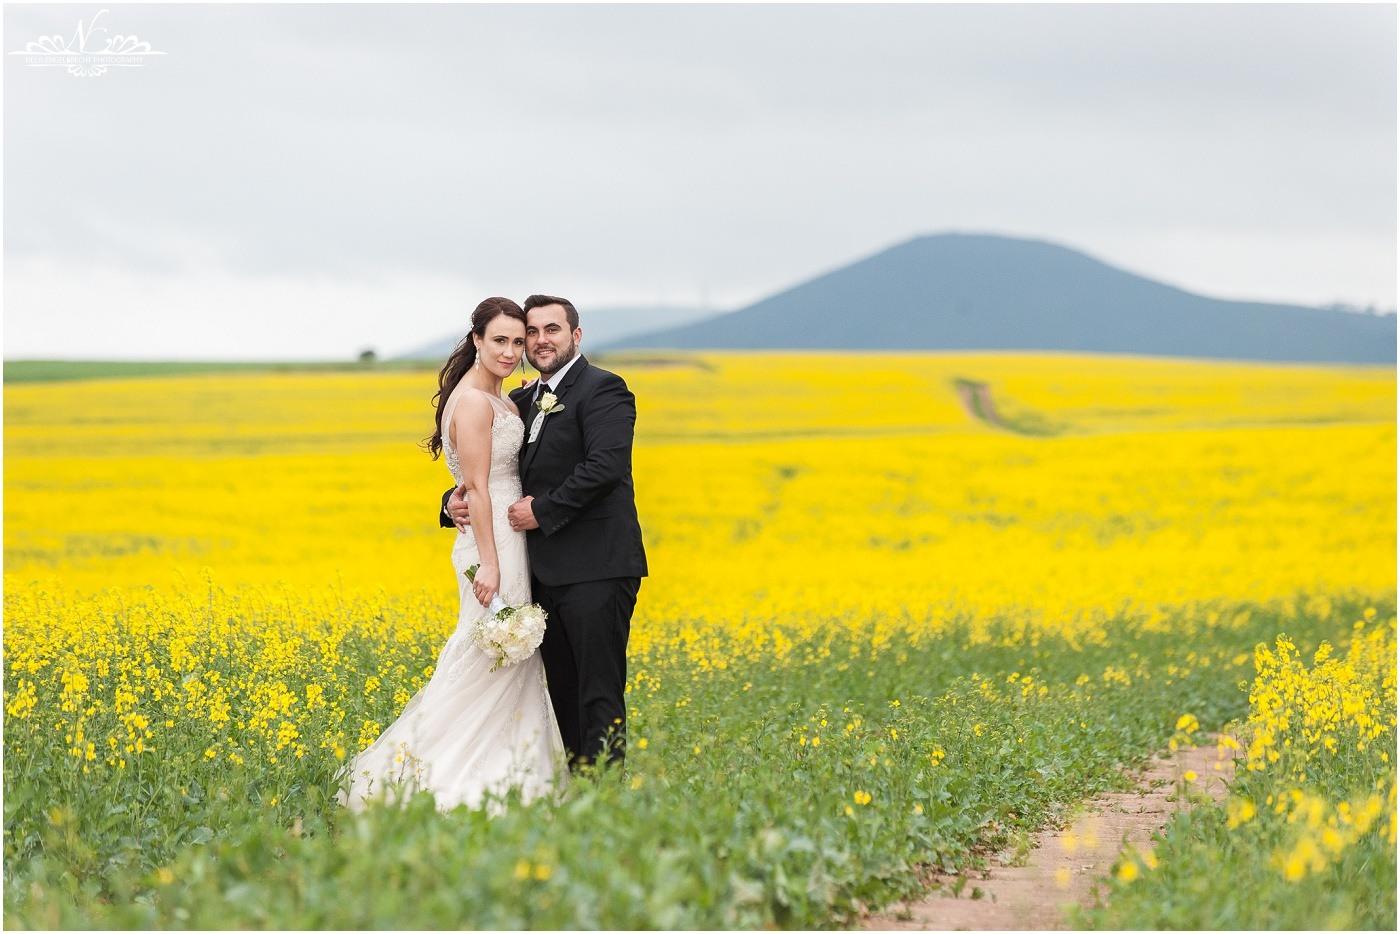 Eensgezind-Wedding-Photos-Nelis-Engelbrecht-Photography-127